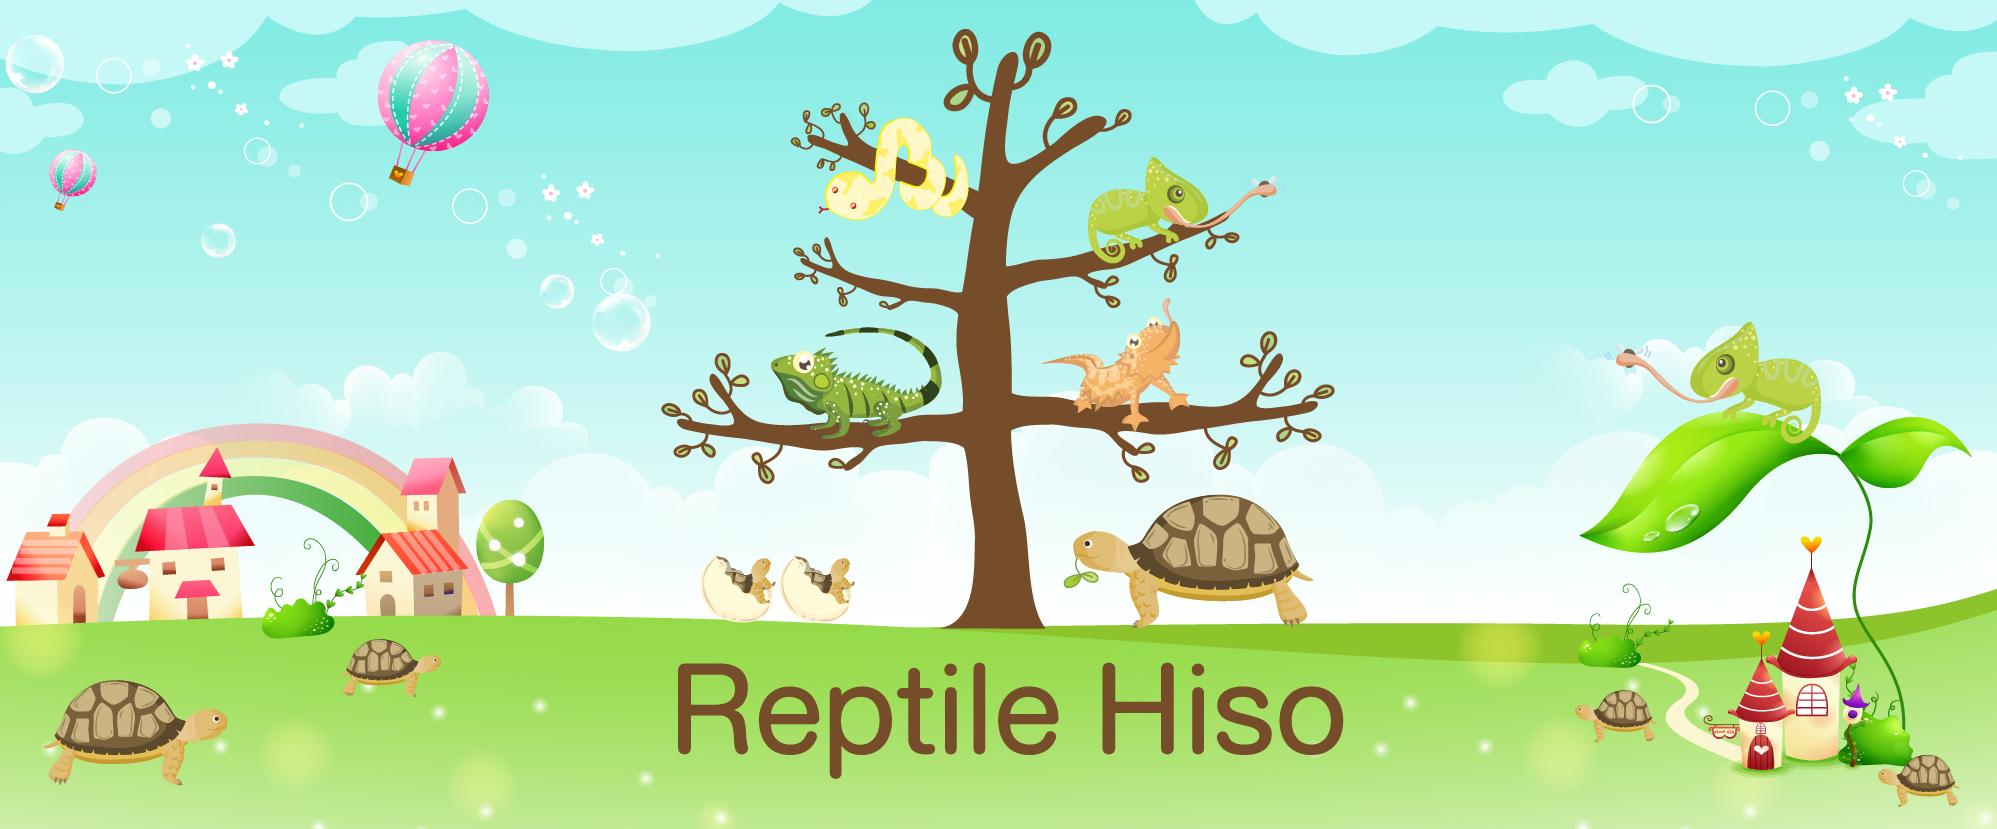 ReptileHiso : ขายเต่าซูคาต้า ขายเต่าบก ฟาร์มเต่ายักษ์ และ สัตว์เลื้อยคลาน